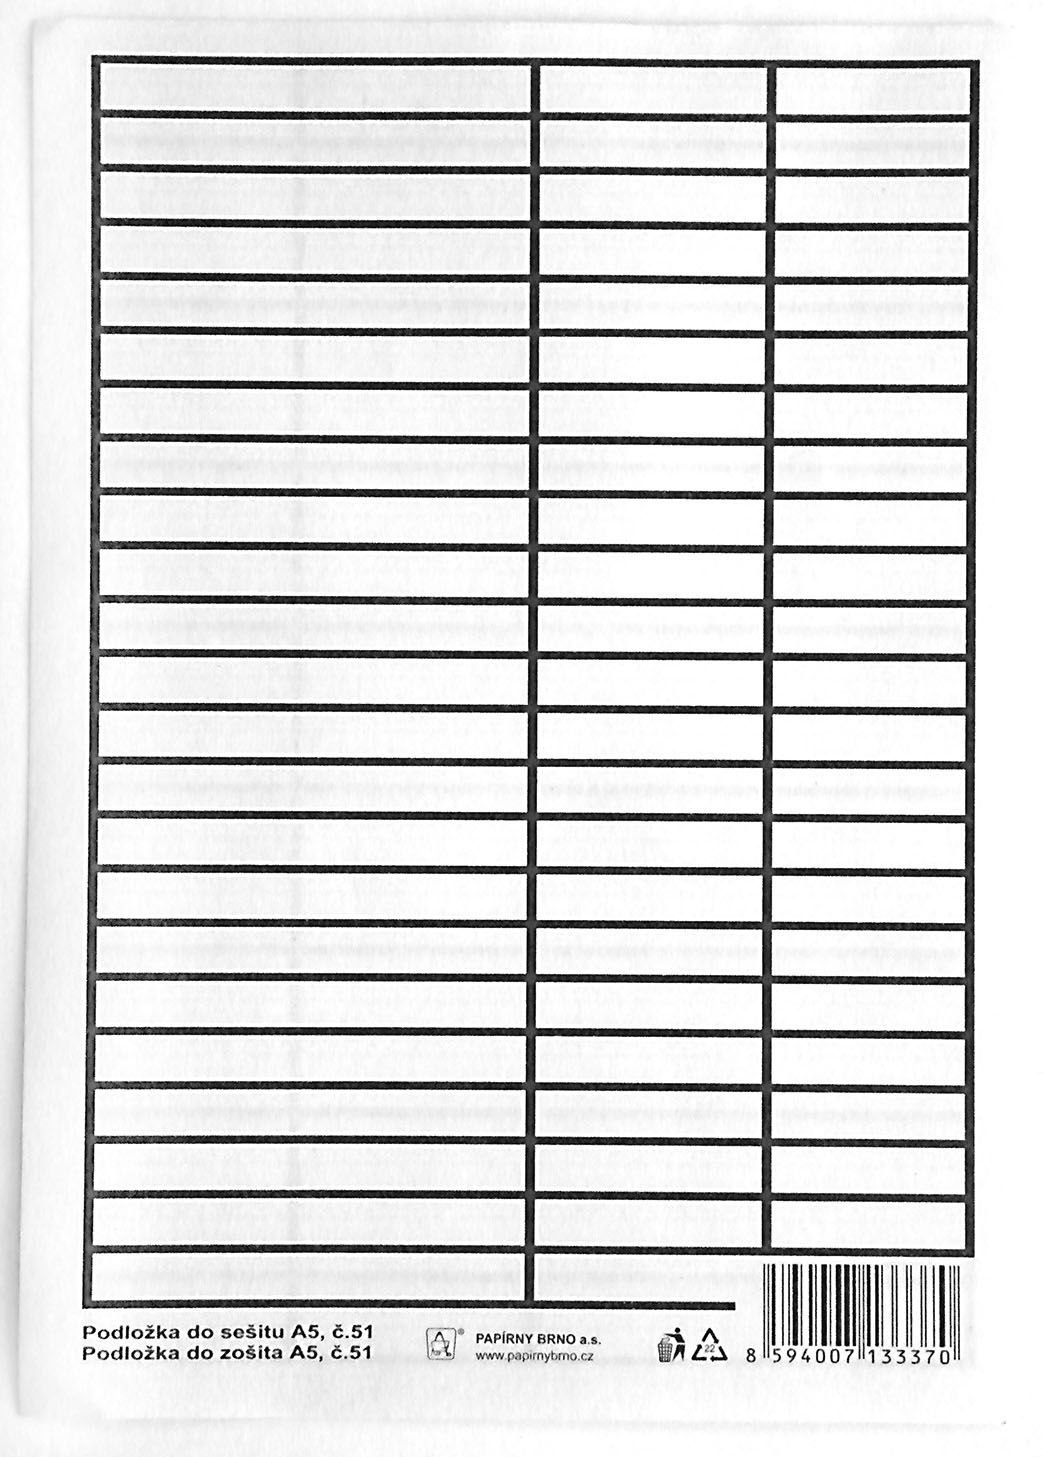 Podložky do sešitů papírové + PVC - podložka A5 / linka - linka / PVC